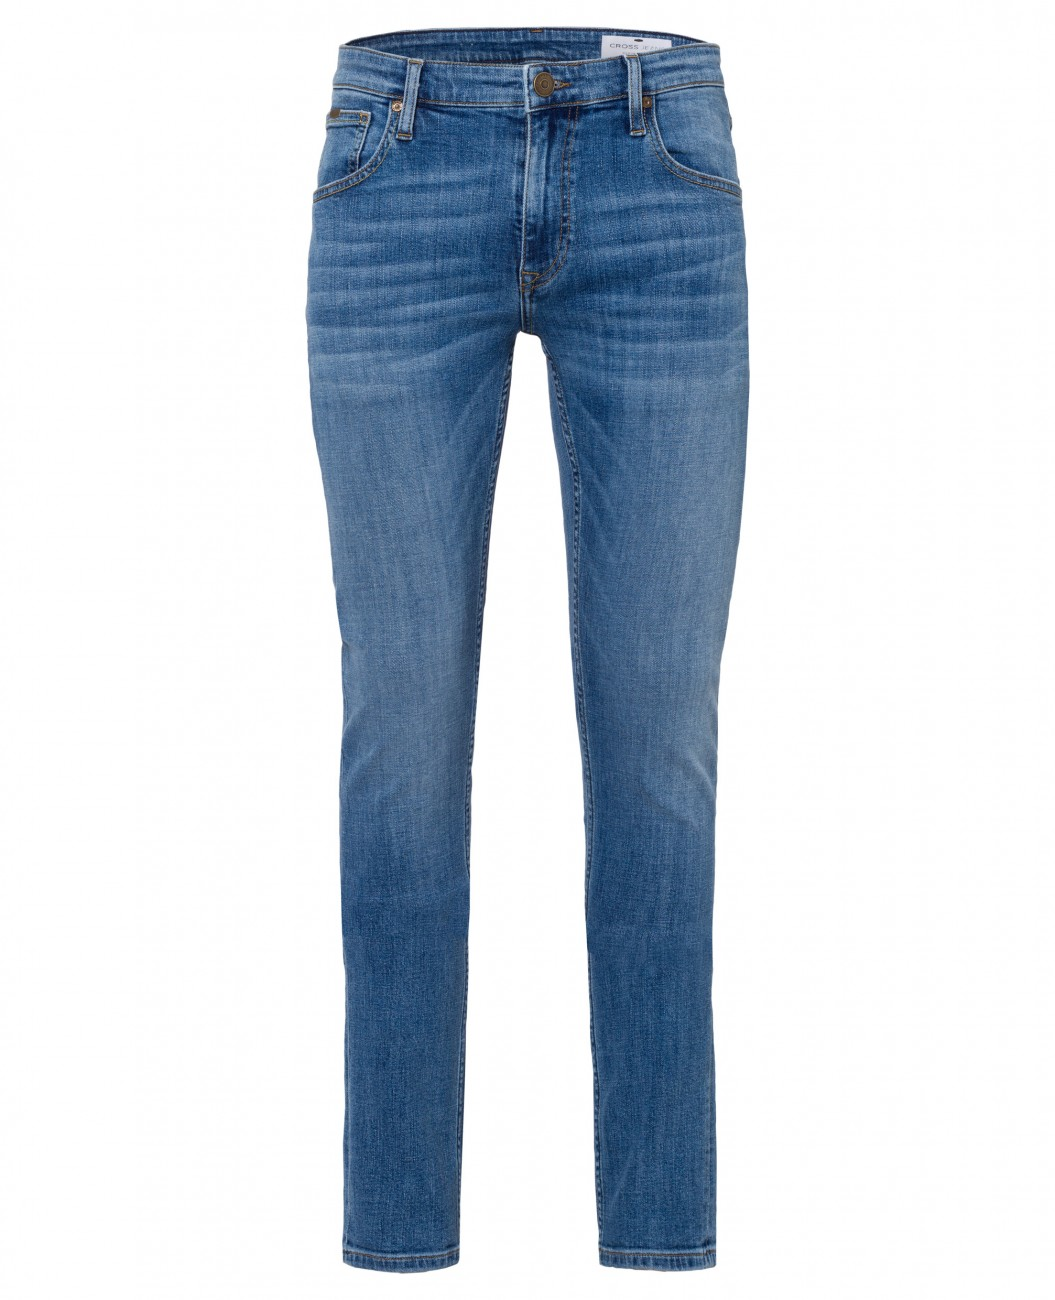 cross herren jeans damien slim fit blau light blue kaufen jeans direct de. Black Bedroom Furniture Sets. Home Design Ideas